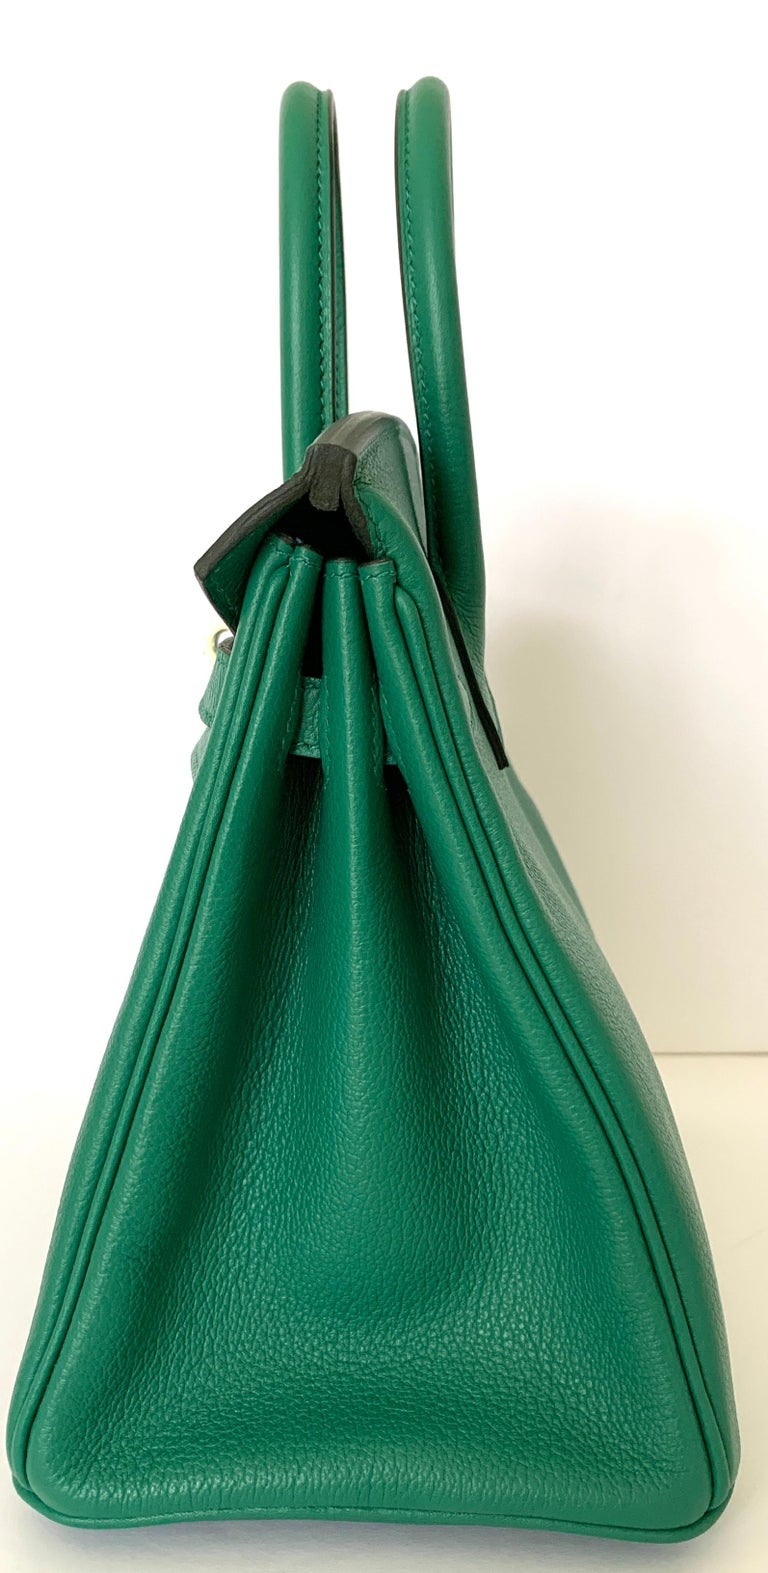 Hermes Birkin 25 Bag Vert Vertigo Green Verso Blue Interior 4